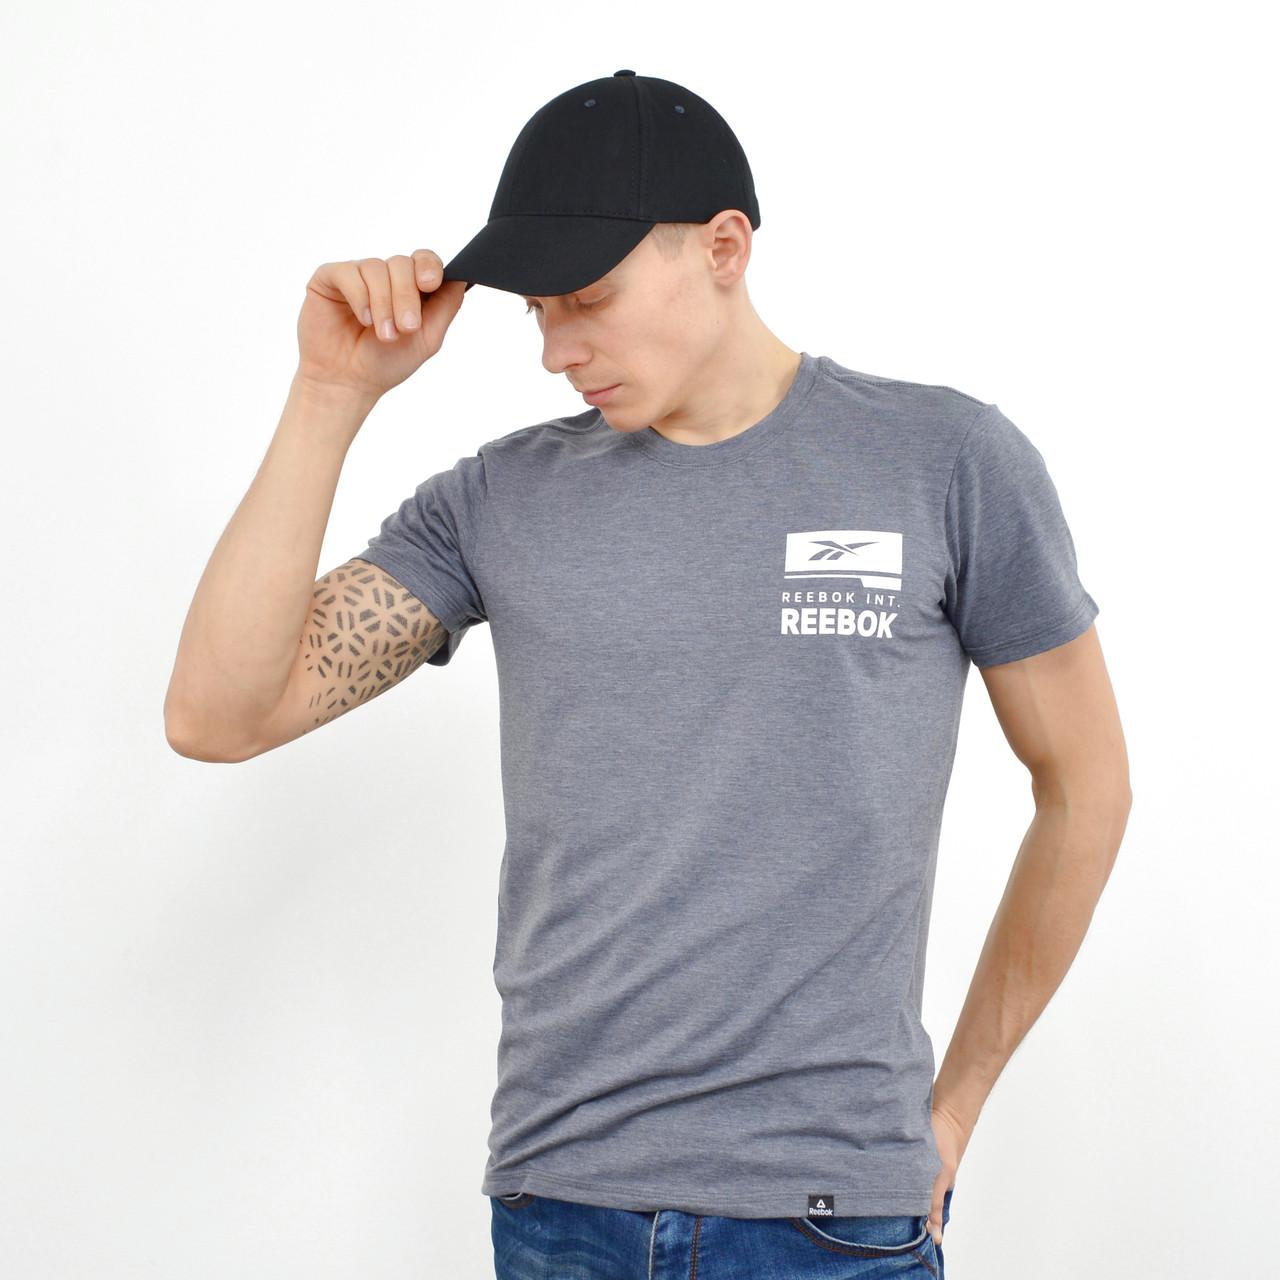 Мужская футболка с накаткой Reebok (реплика)  Серый